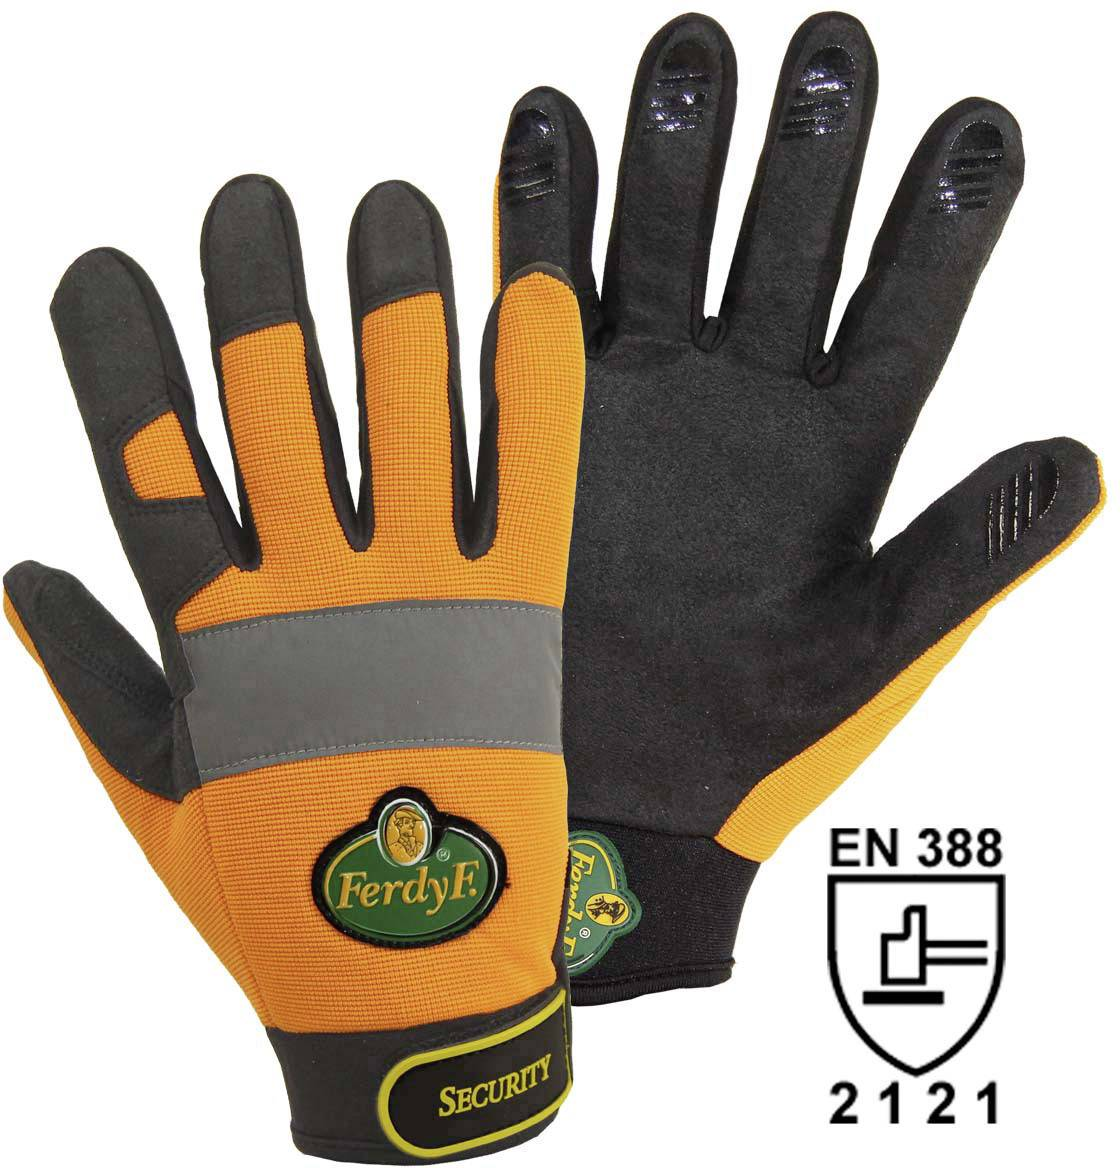 Montážne rukavice FerdyF. Mechanics Security 1905, velikost rukavic: 9, L